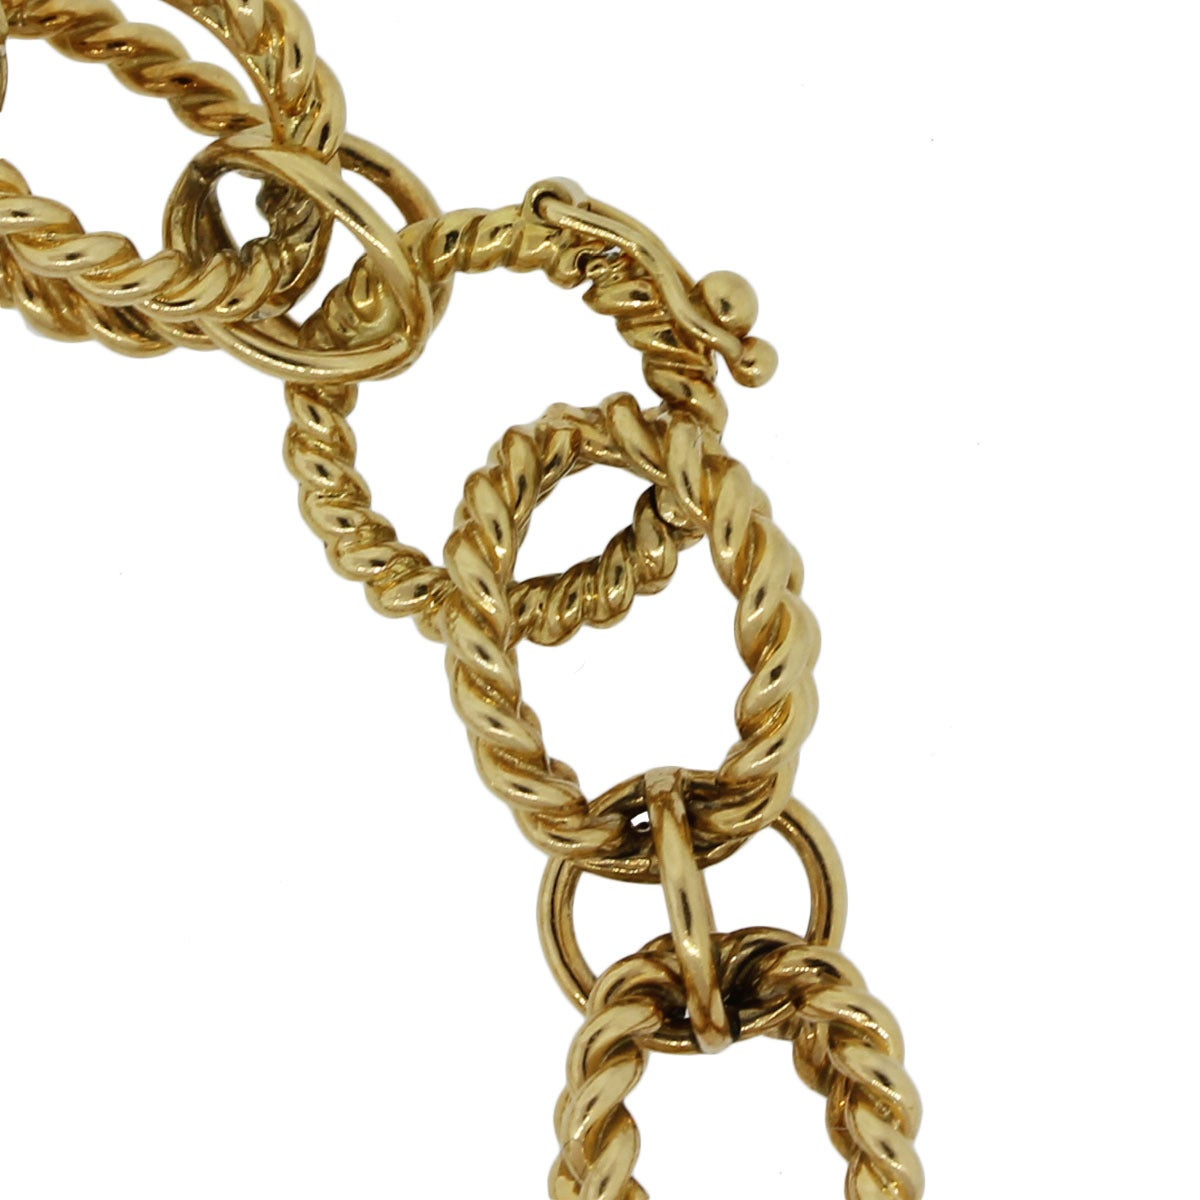 Tiffany & Co  Schlumberger Gold Rope Link Bracelet